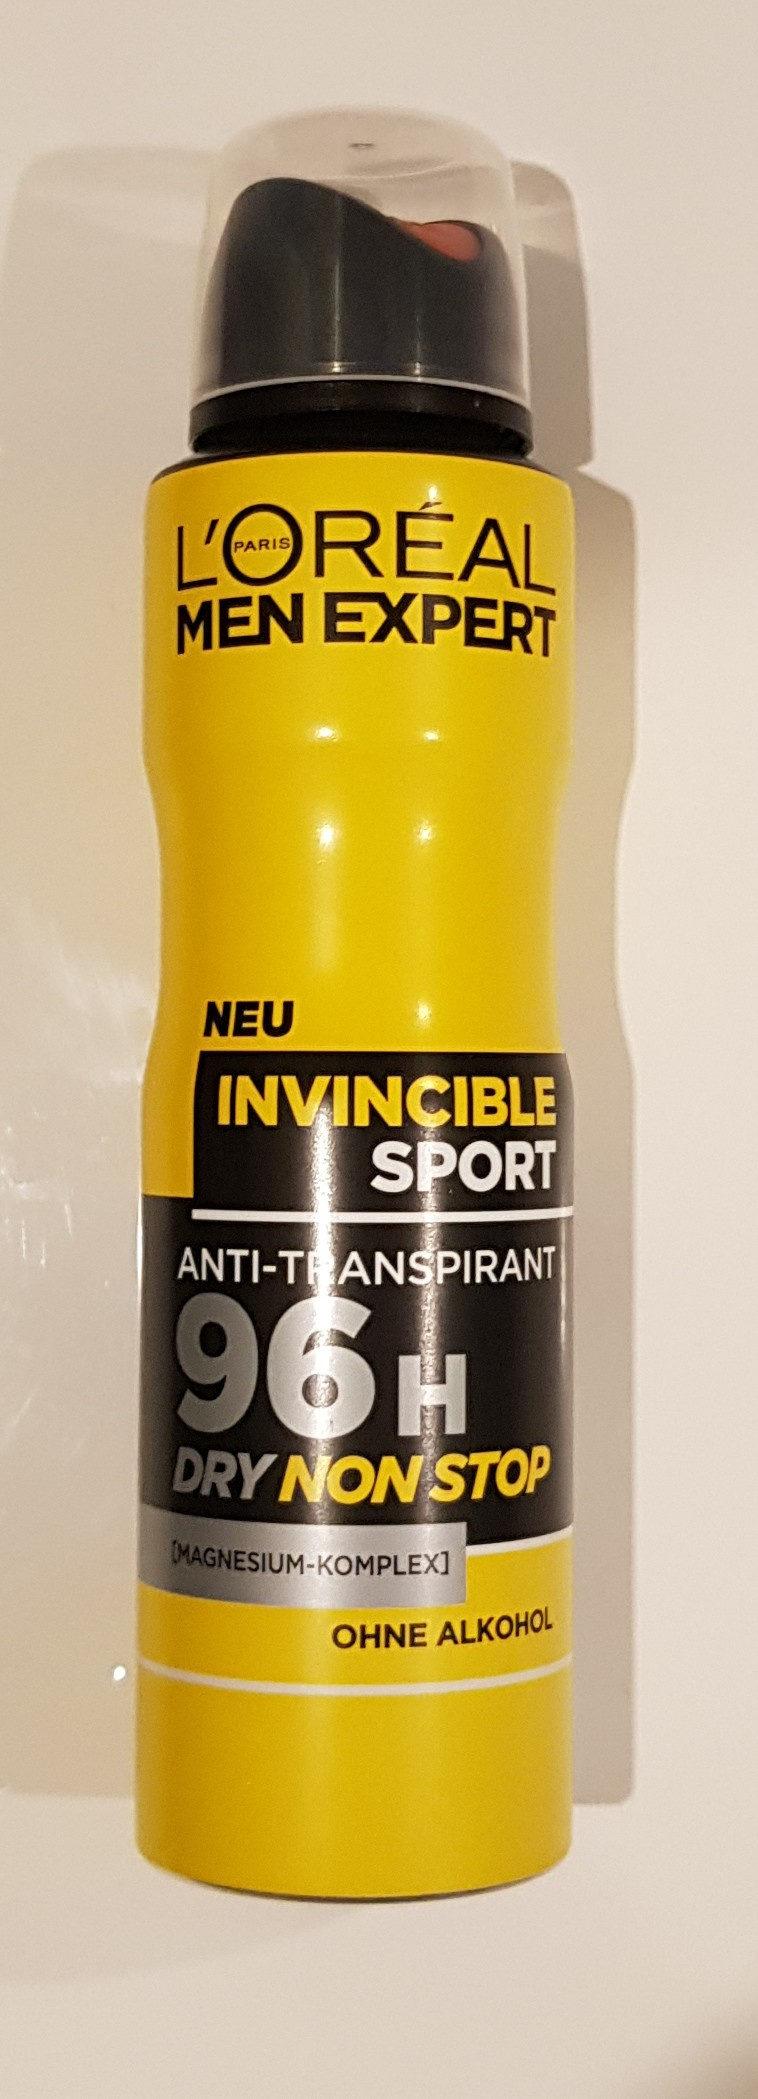 Deodorant (Invincible Sport) - Product